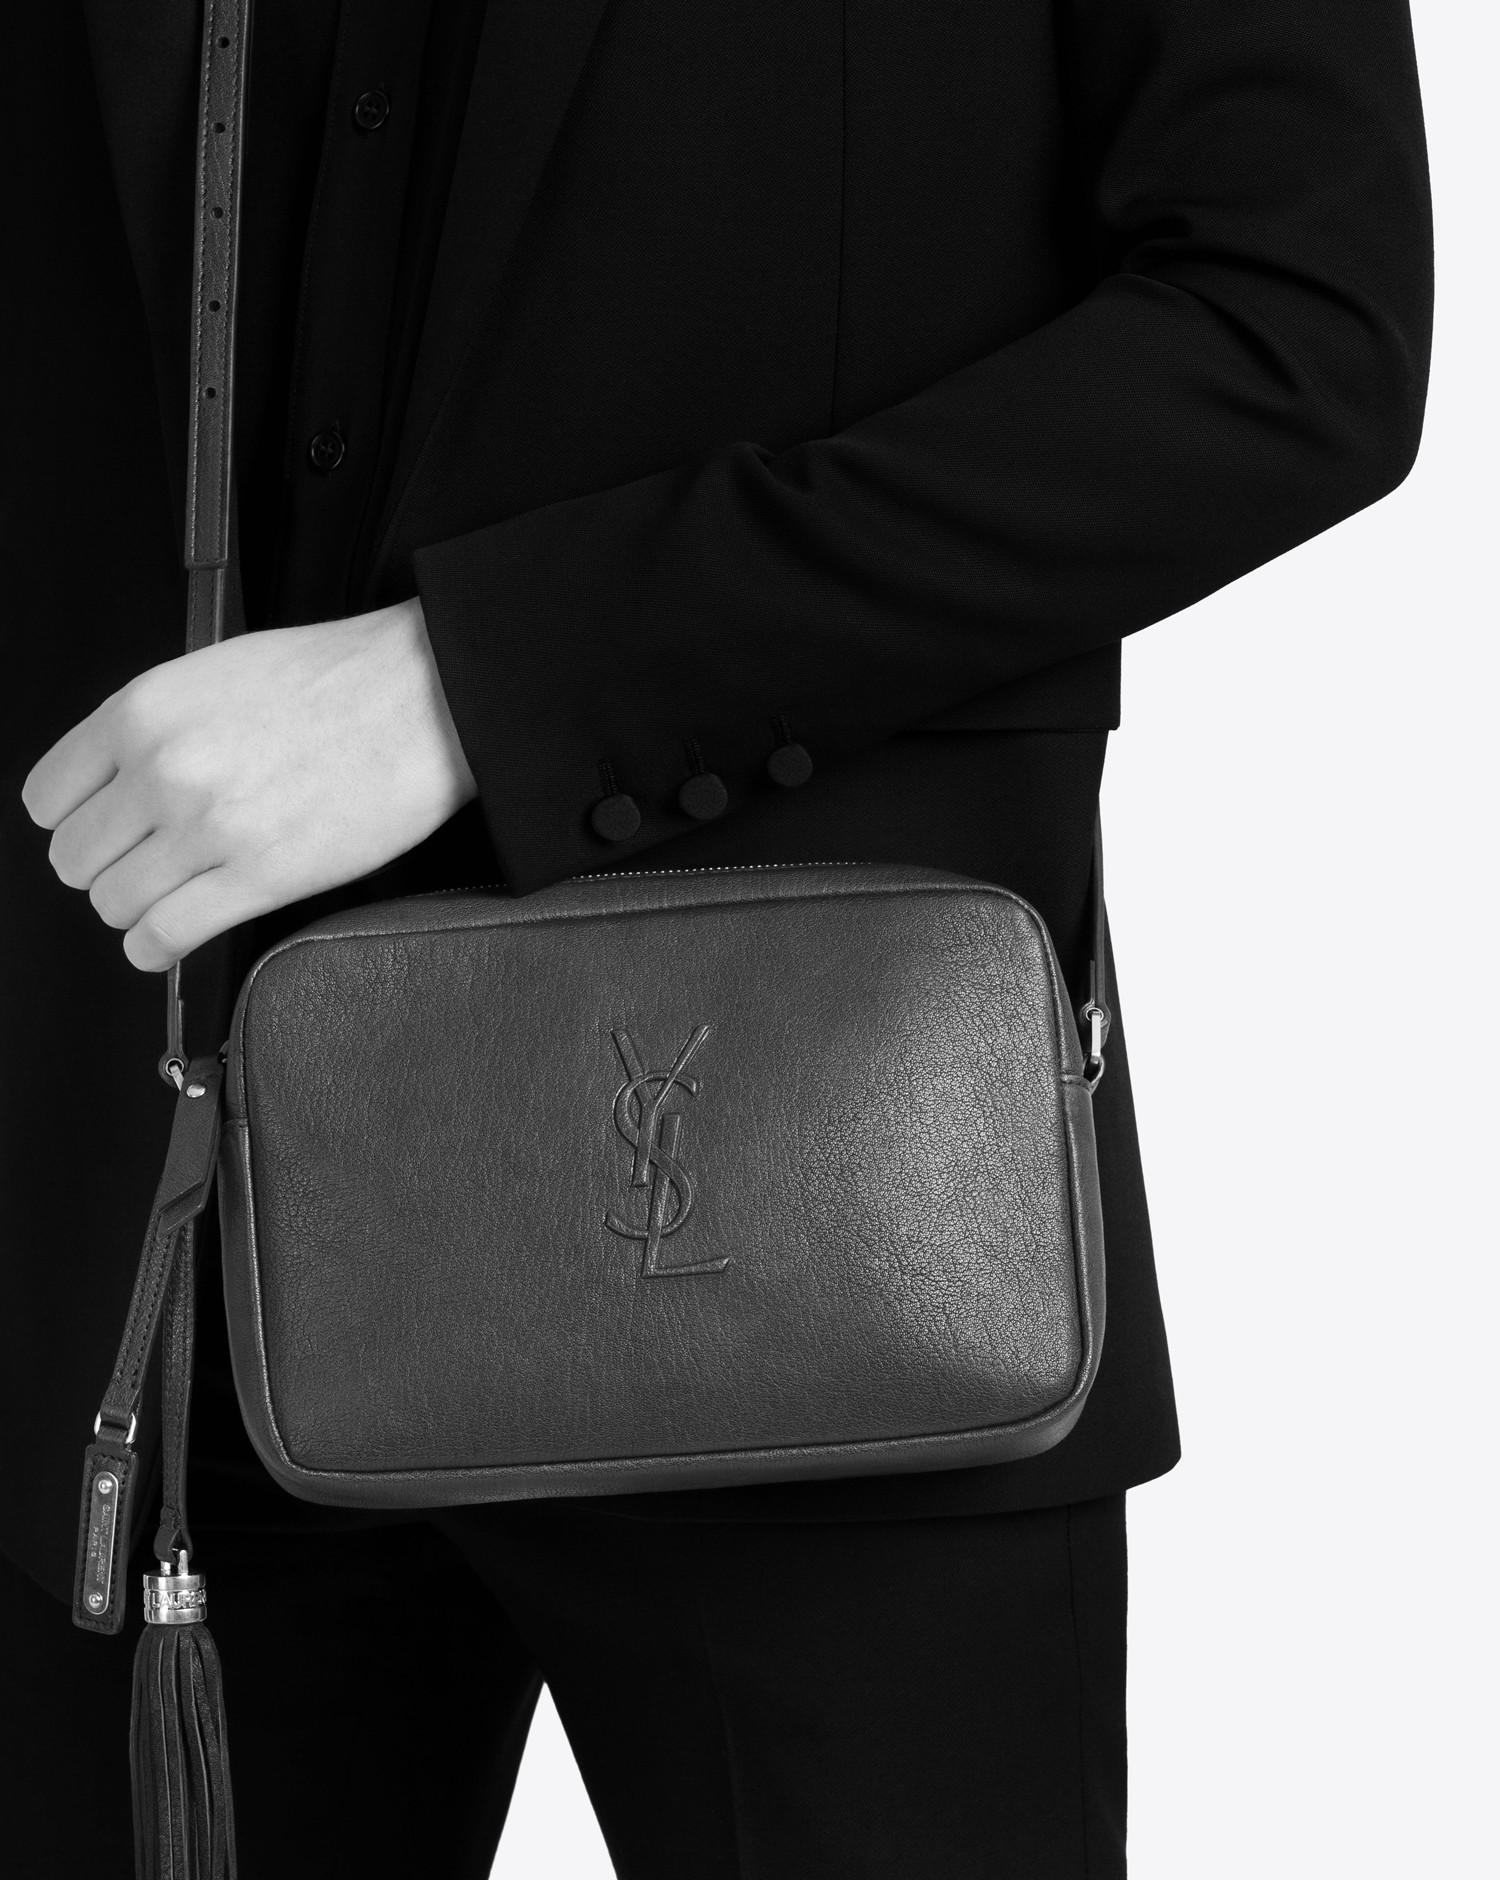 c24376f1906 Saint Laurent Small Monogram Lou Camera Bag In Fog Leather - Lyst